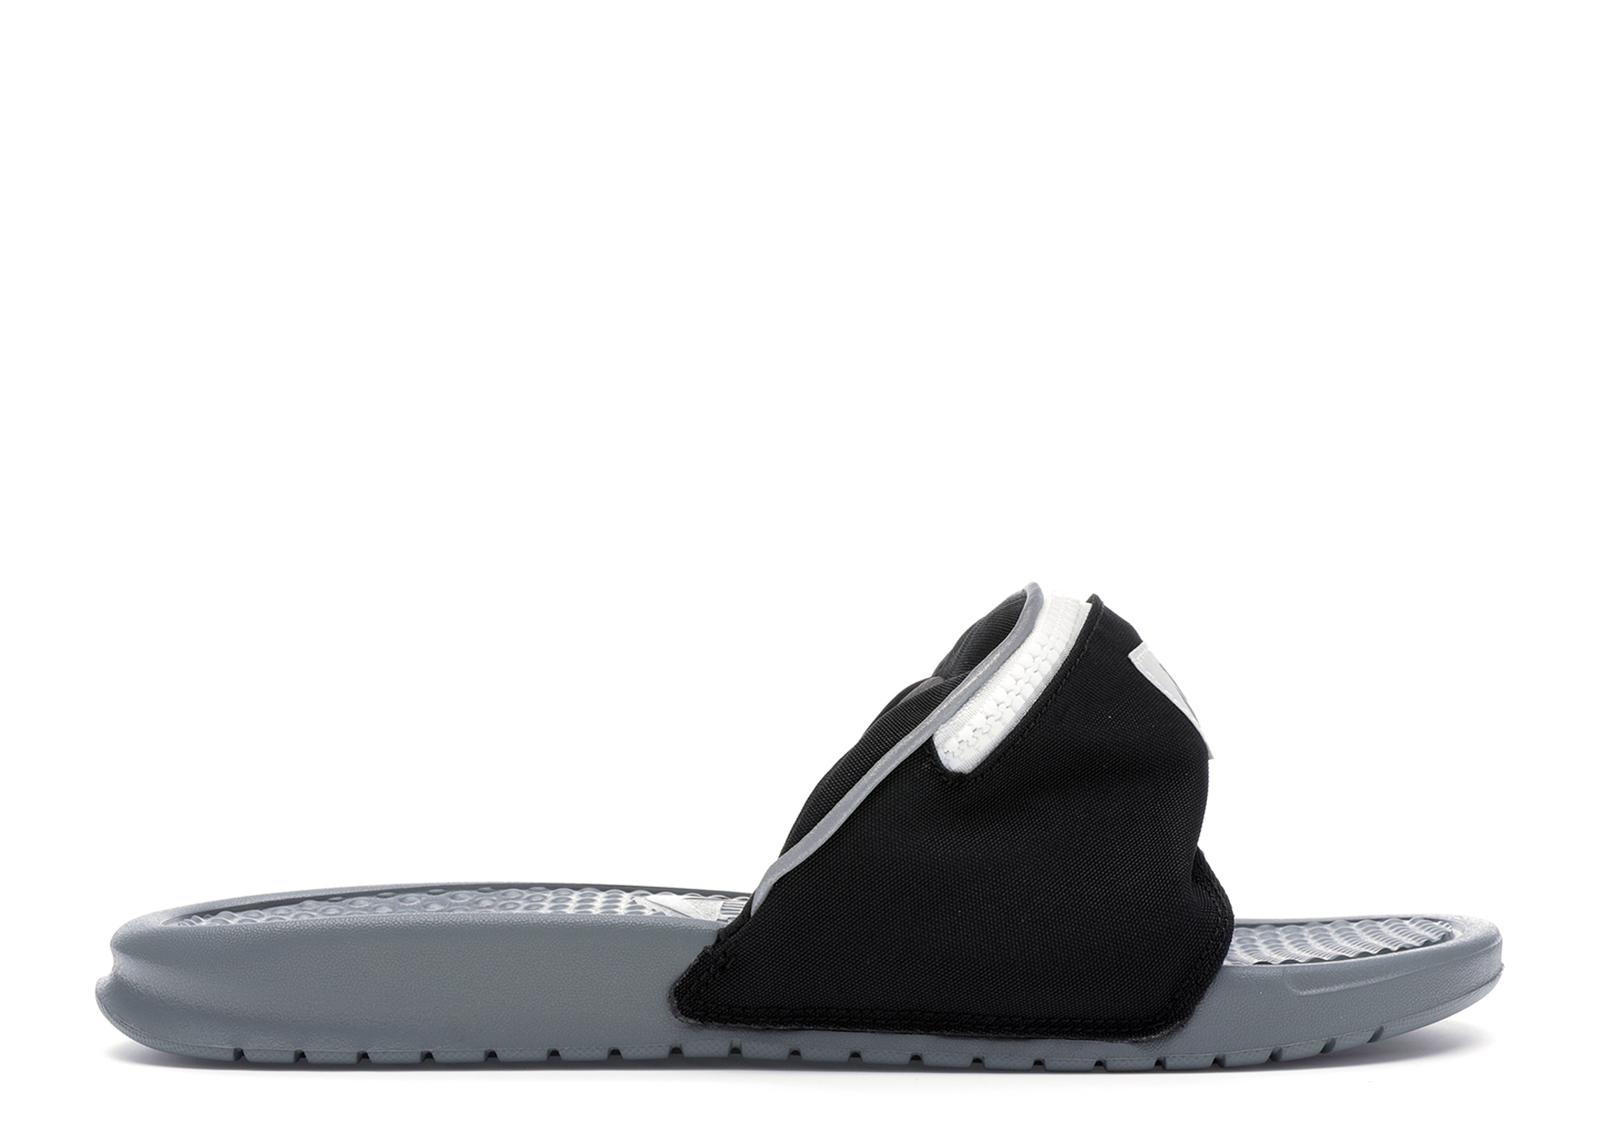 Nike Benassi JDI Fanny Pack Cool Grey